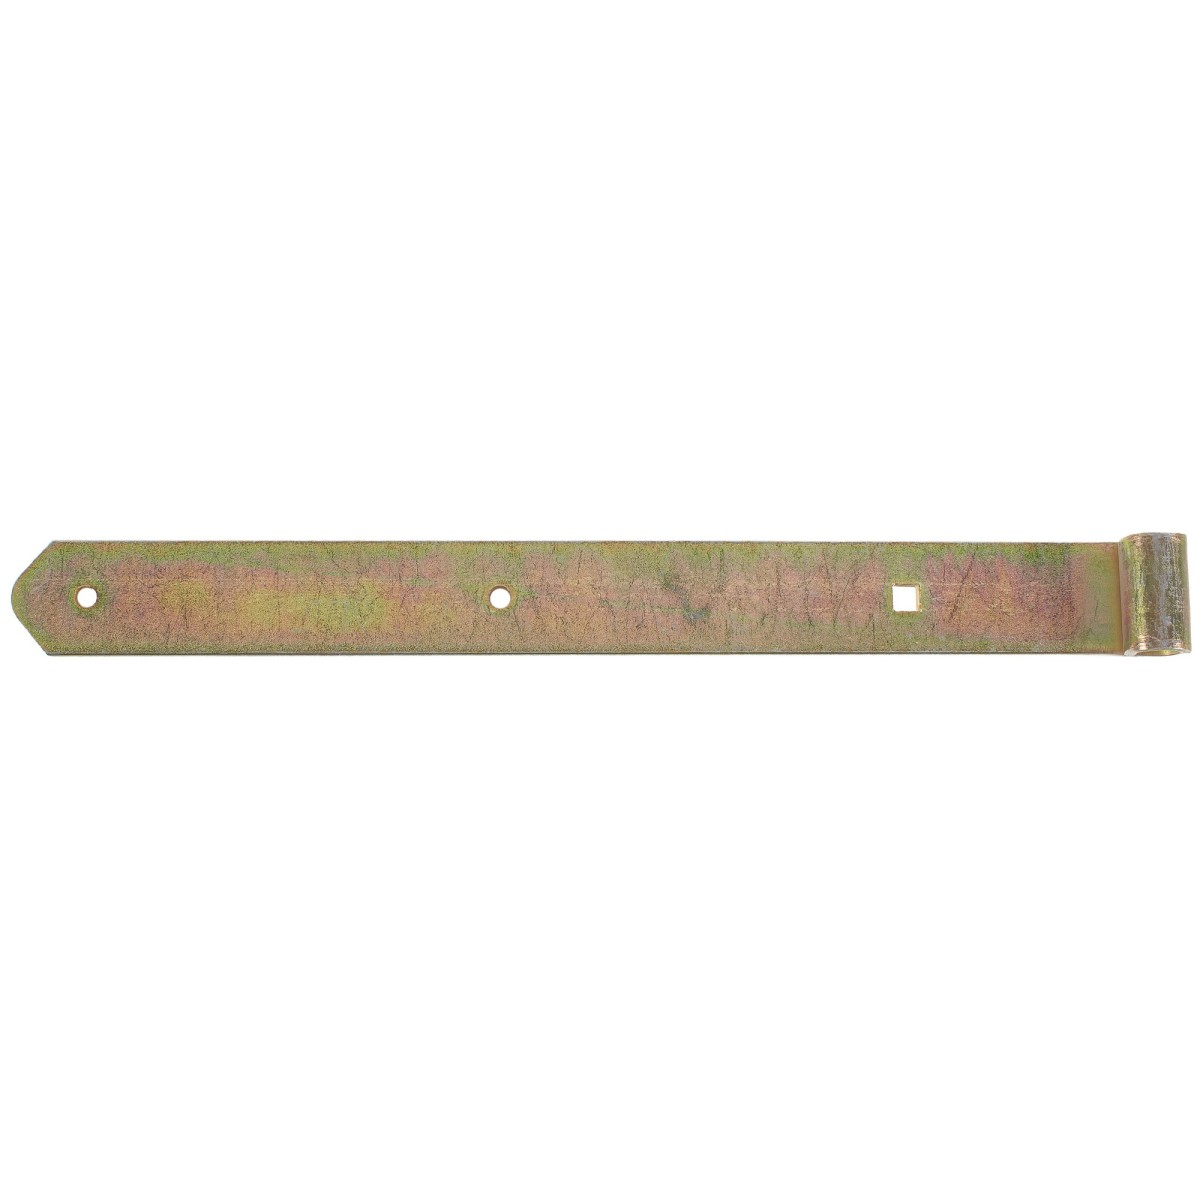 Петля воротная накидная d 13 400x40х5 мм